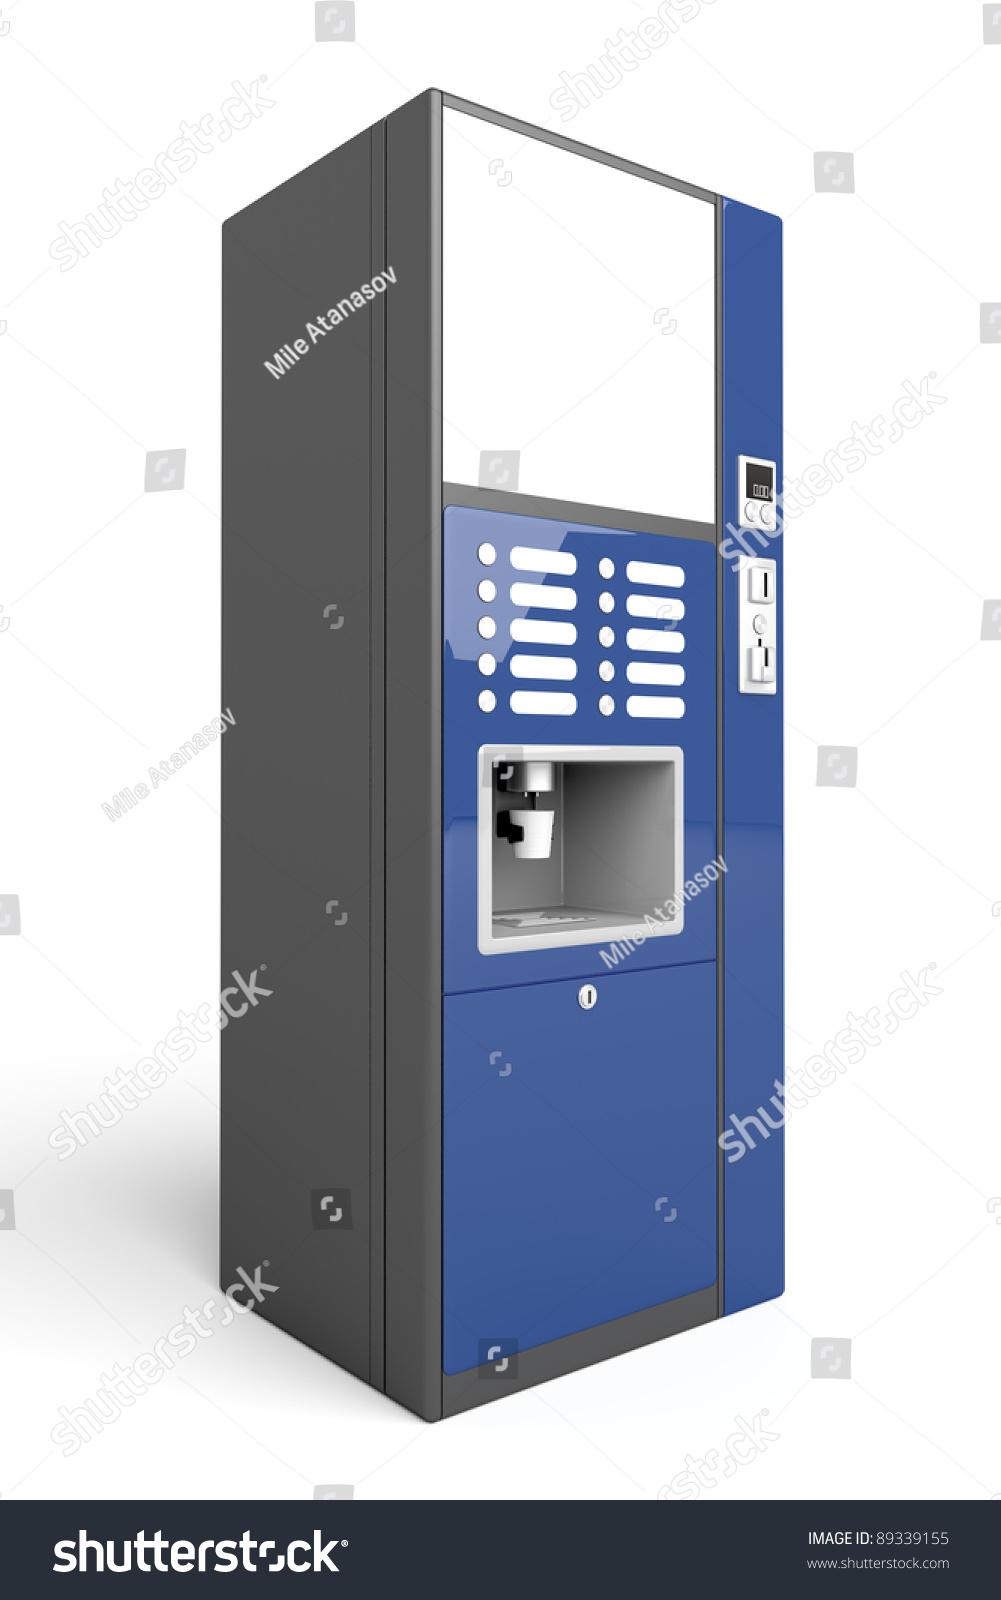 vending machine background